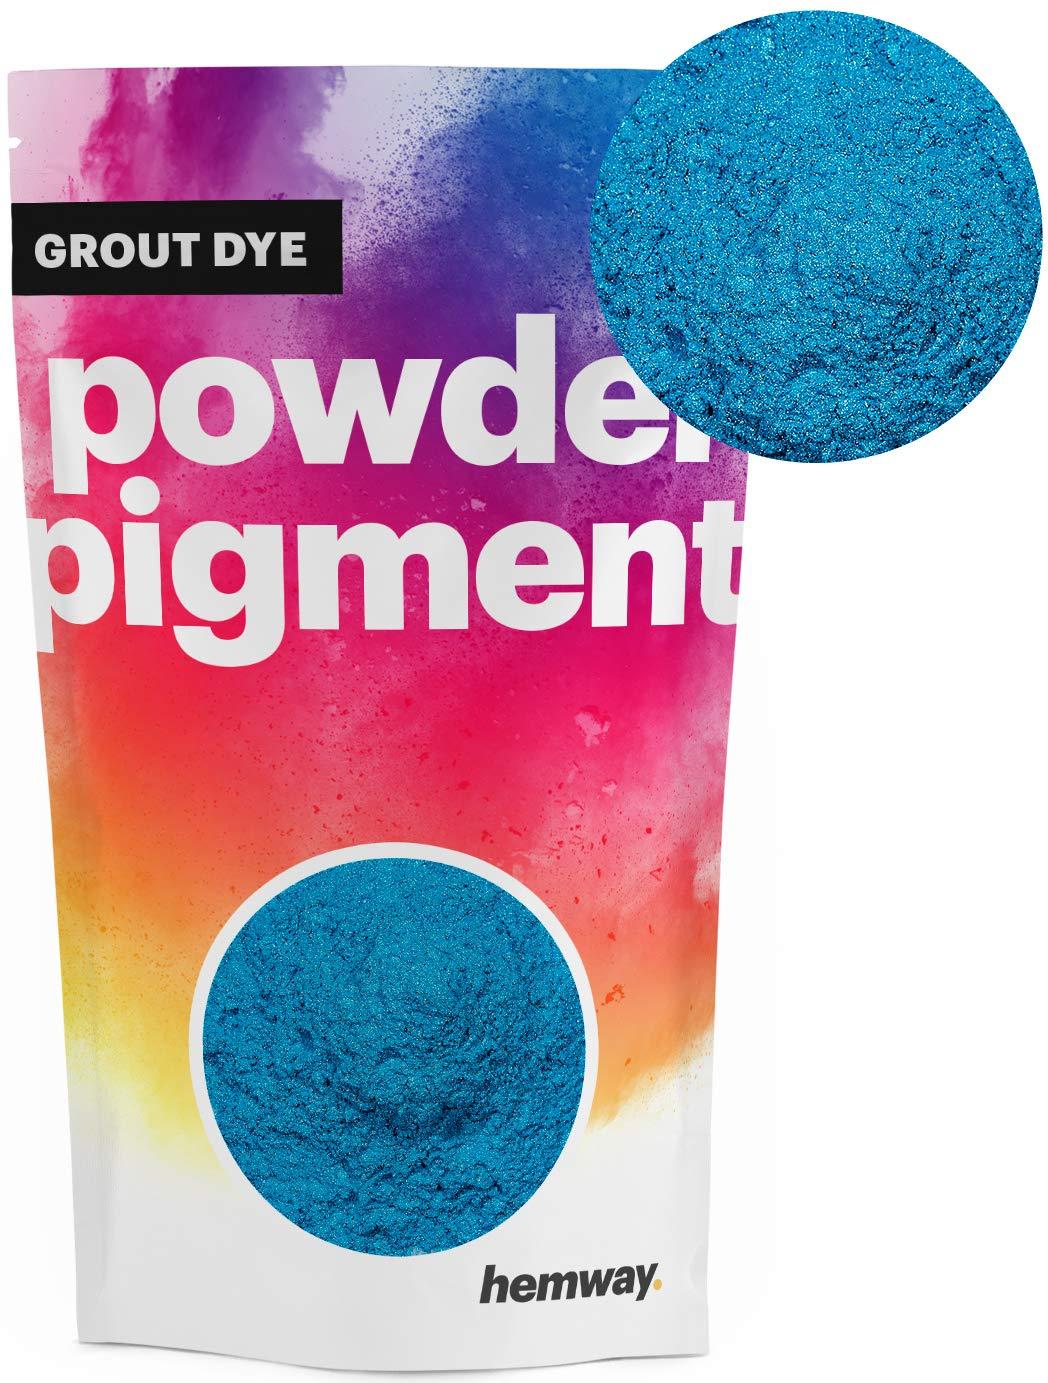 Hemway Grout Dye Pigment Concrete Colour Powder Render Mortar Pointing Powdered Brick Toner (1.8oz / 50g, Metallic Ocean Blue)